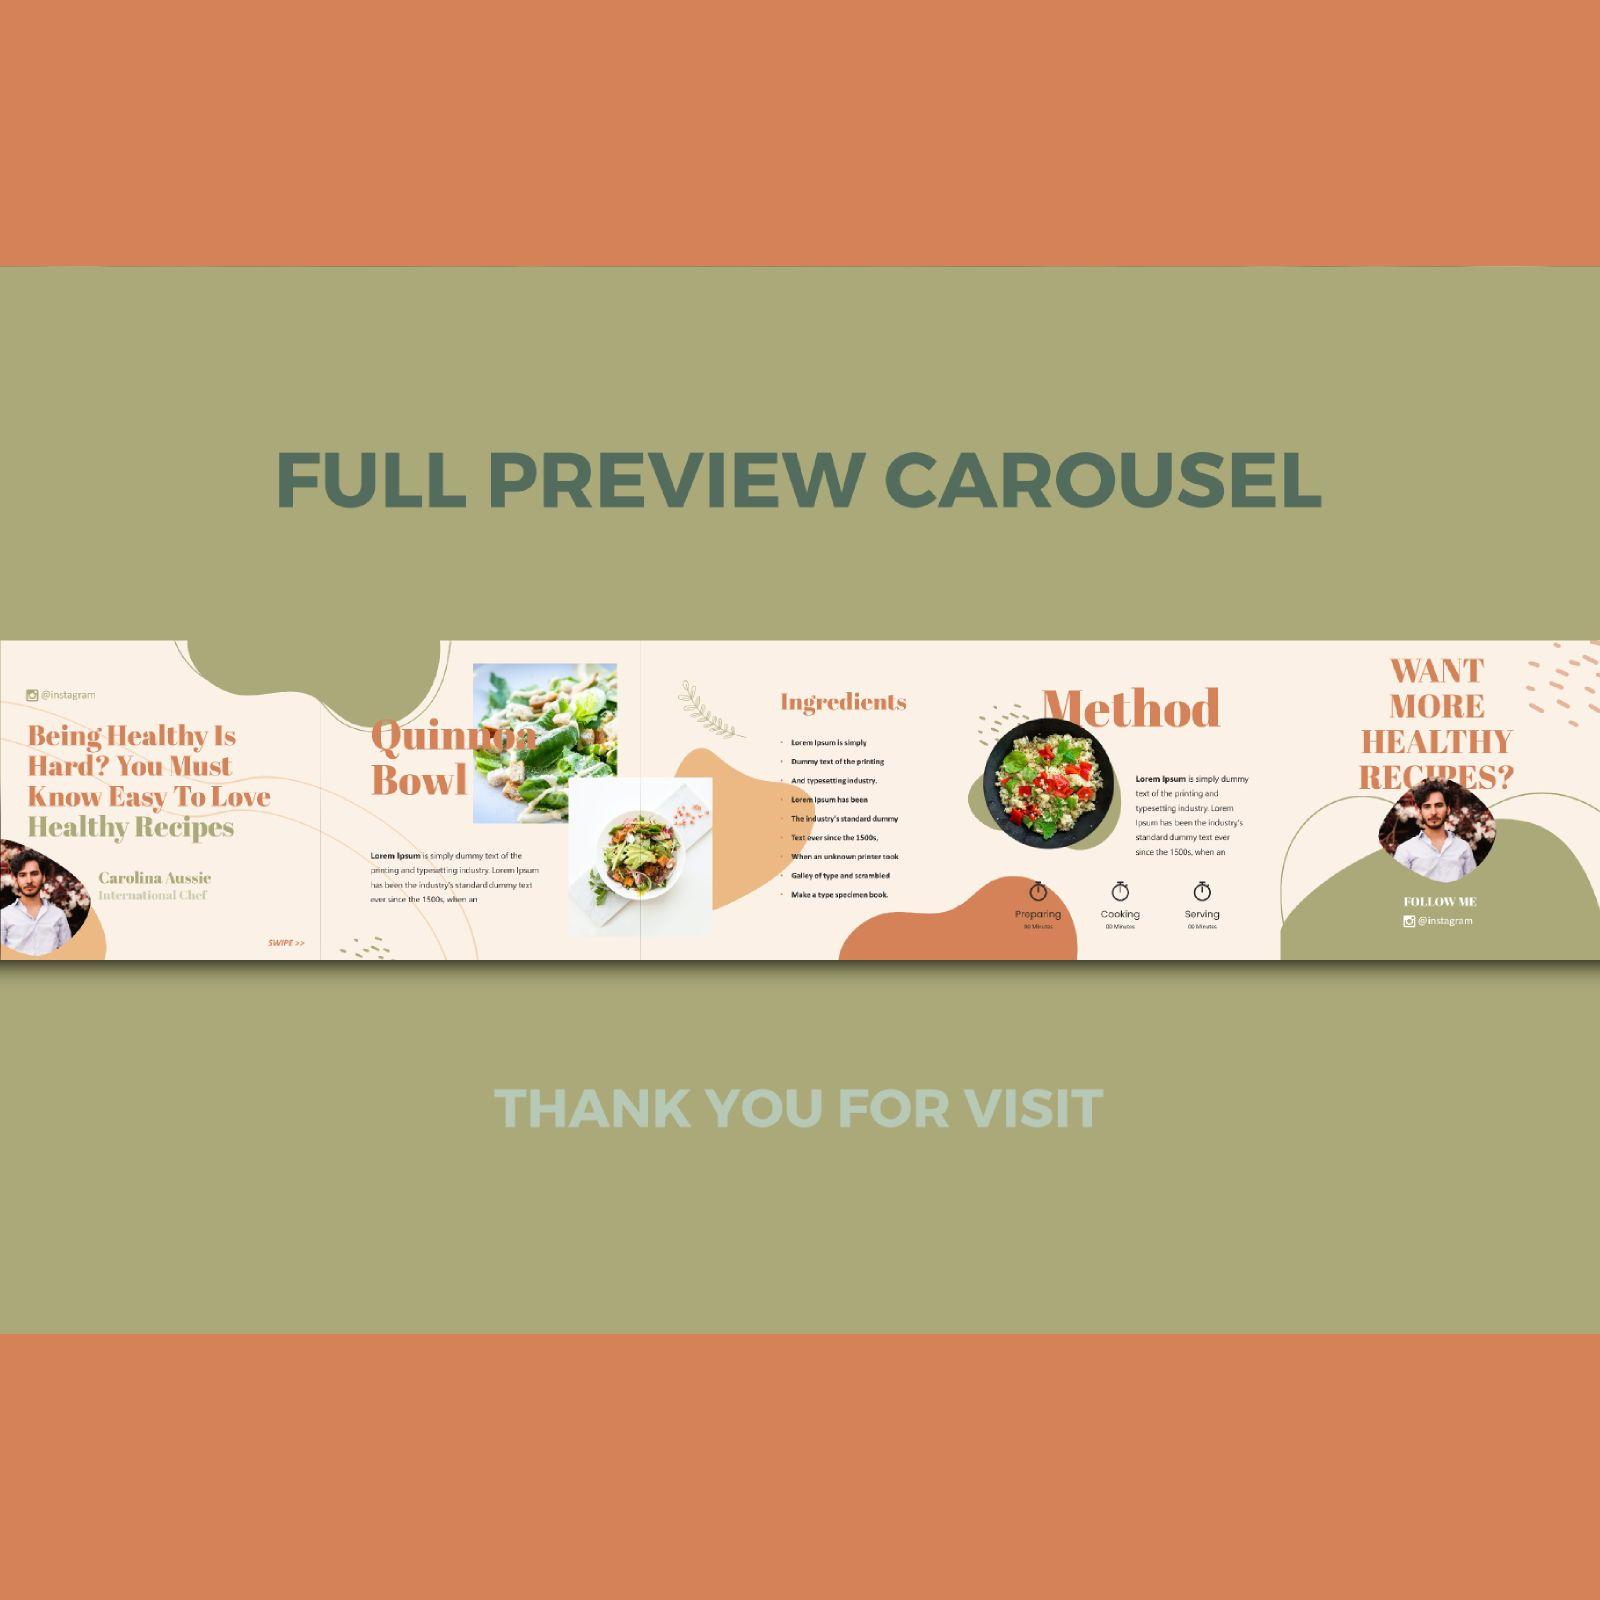 Healthy recipes instagram carousel keynote template, Slide 3, 08362, Infographics — PoweredTemplate.com